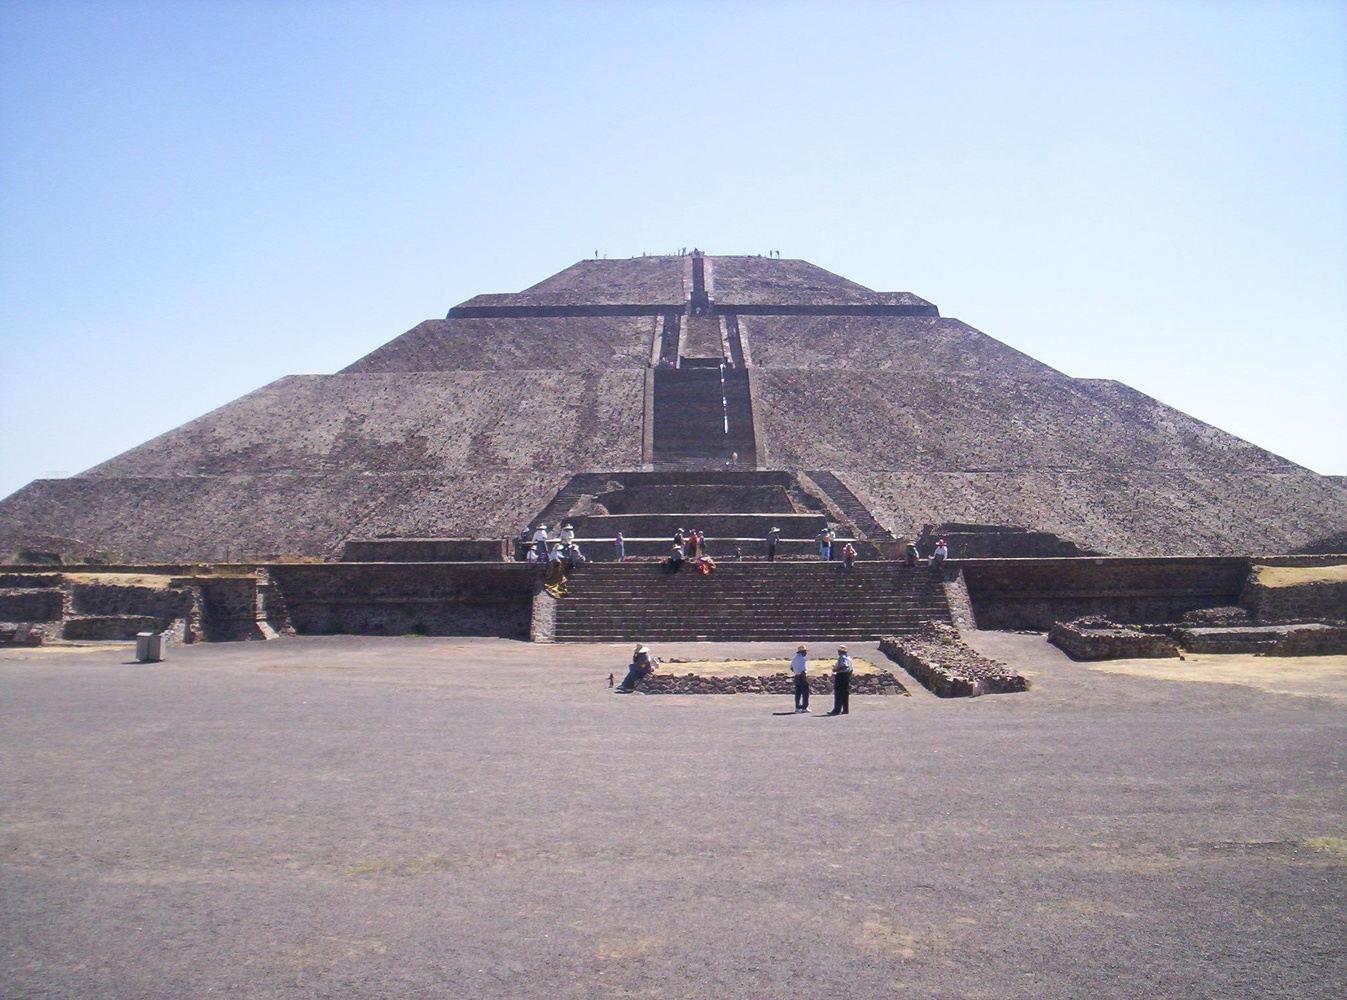 Mexico City - Tehotihuacan Piramids